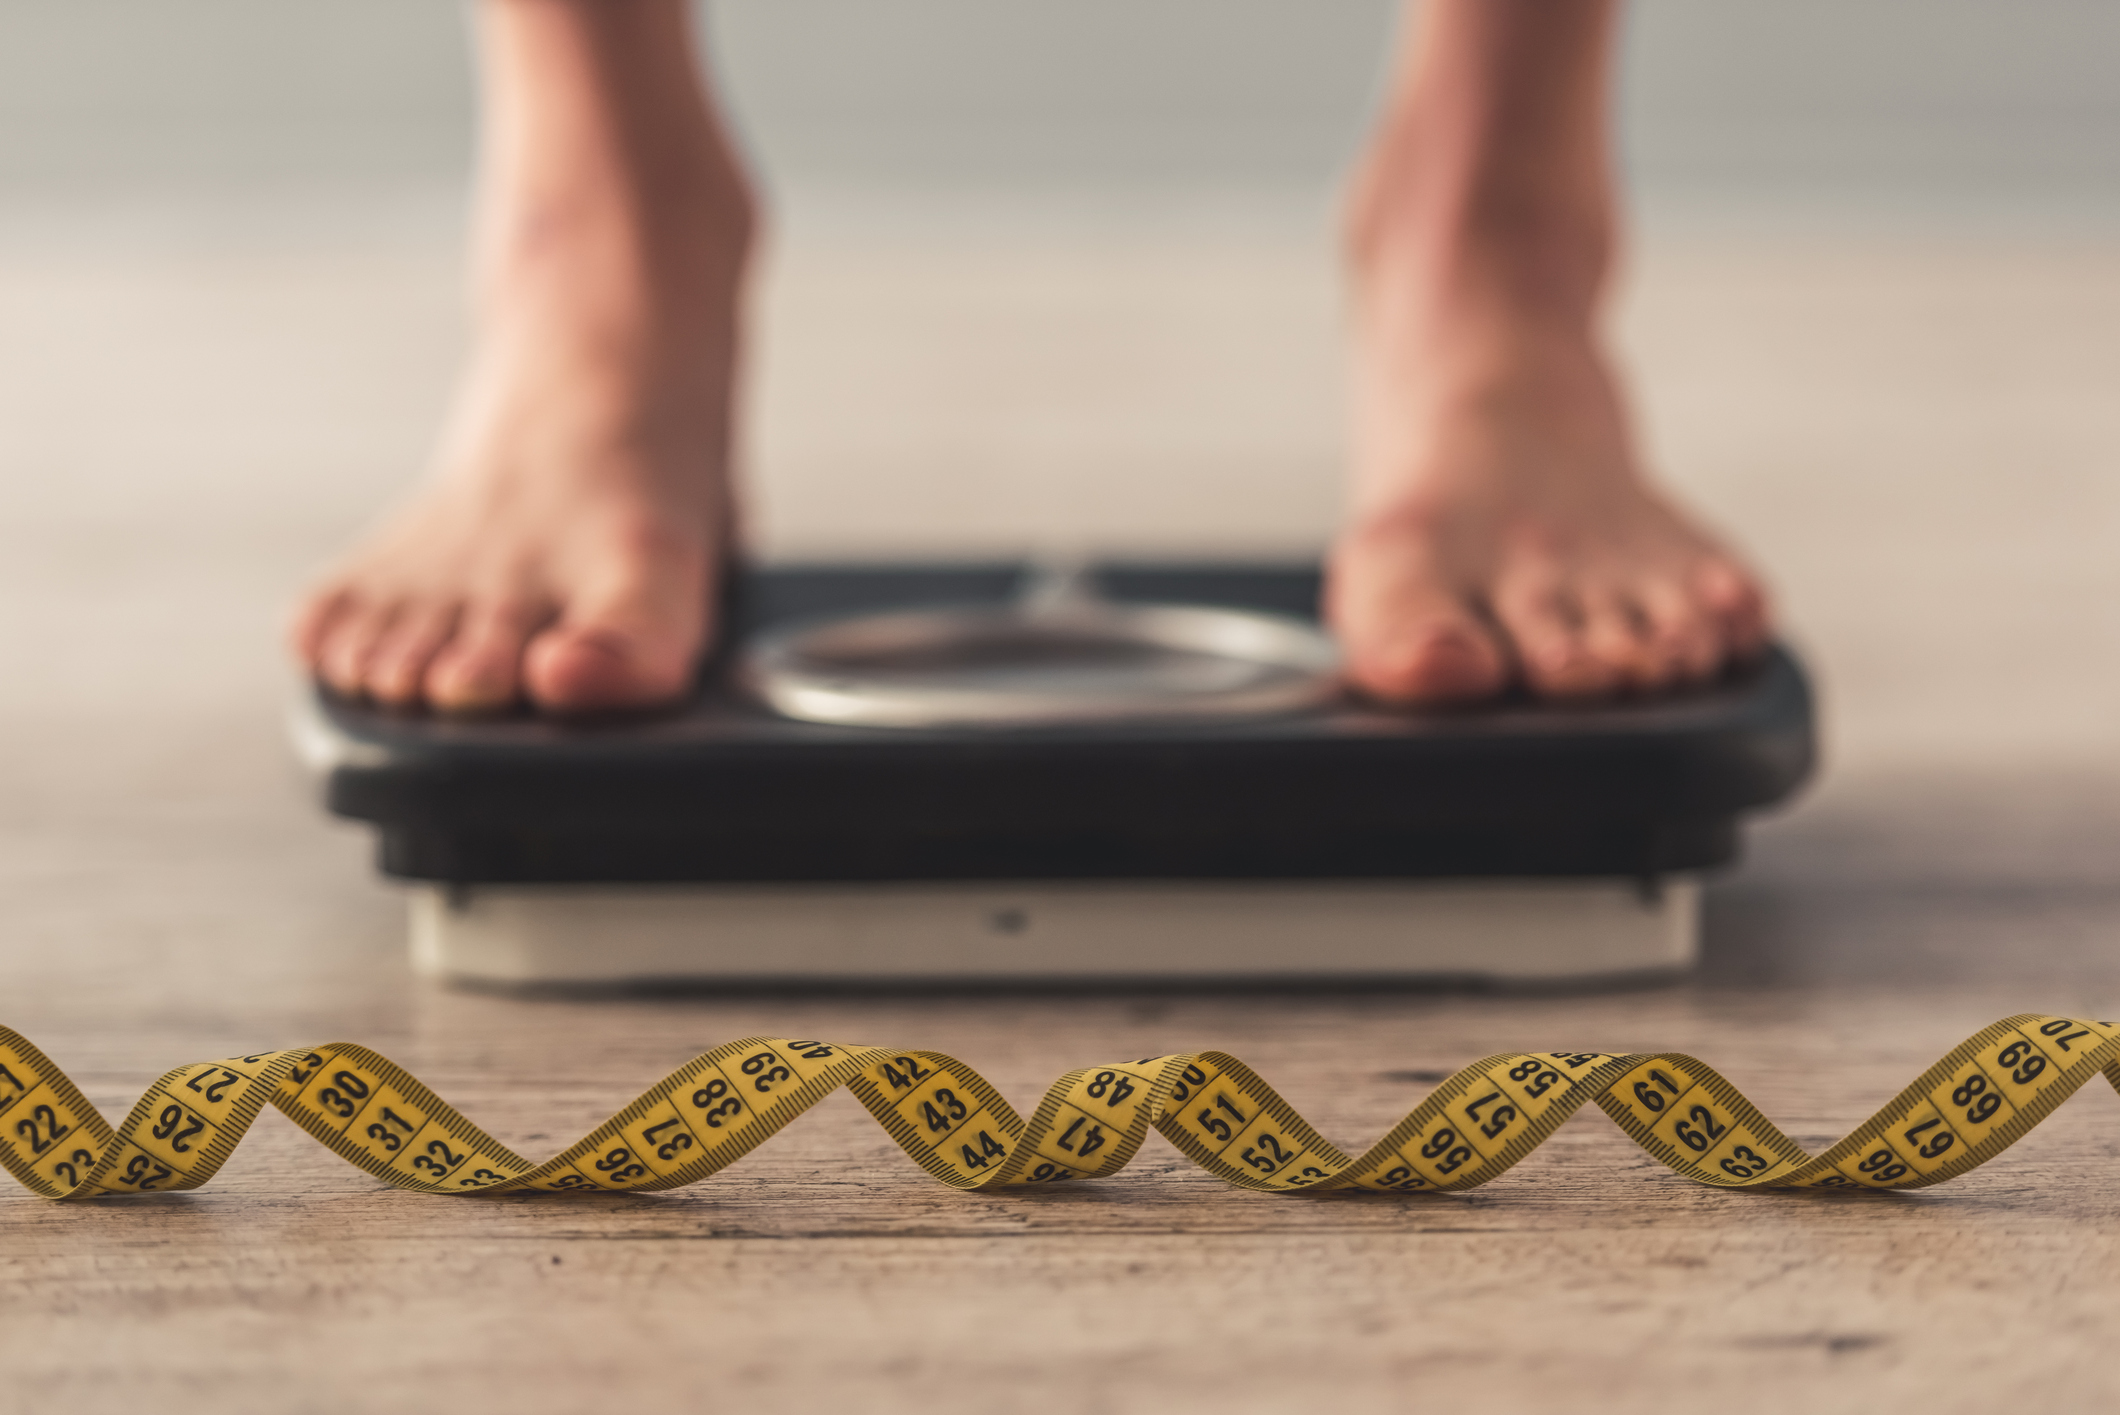 pierderea în greutate eindhoven